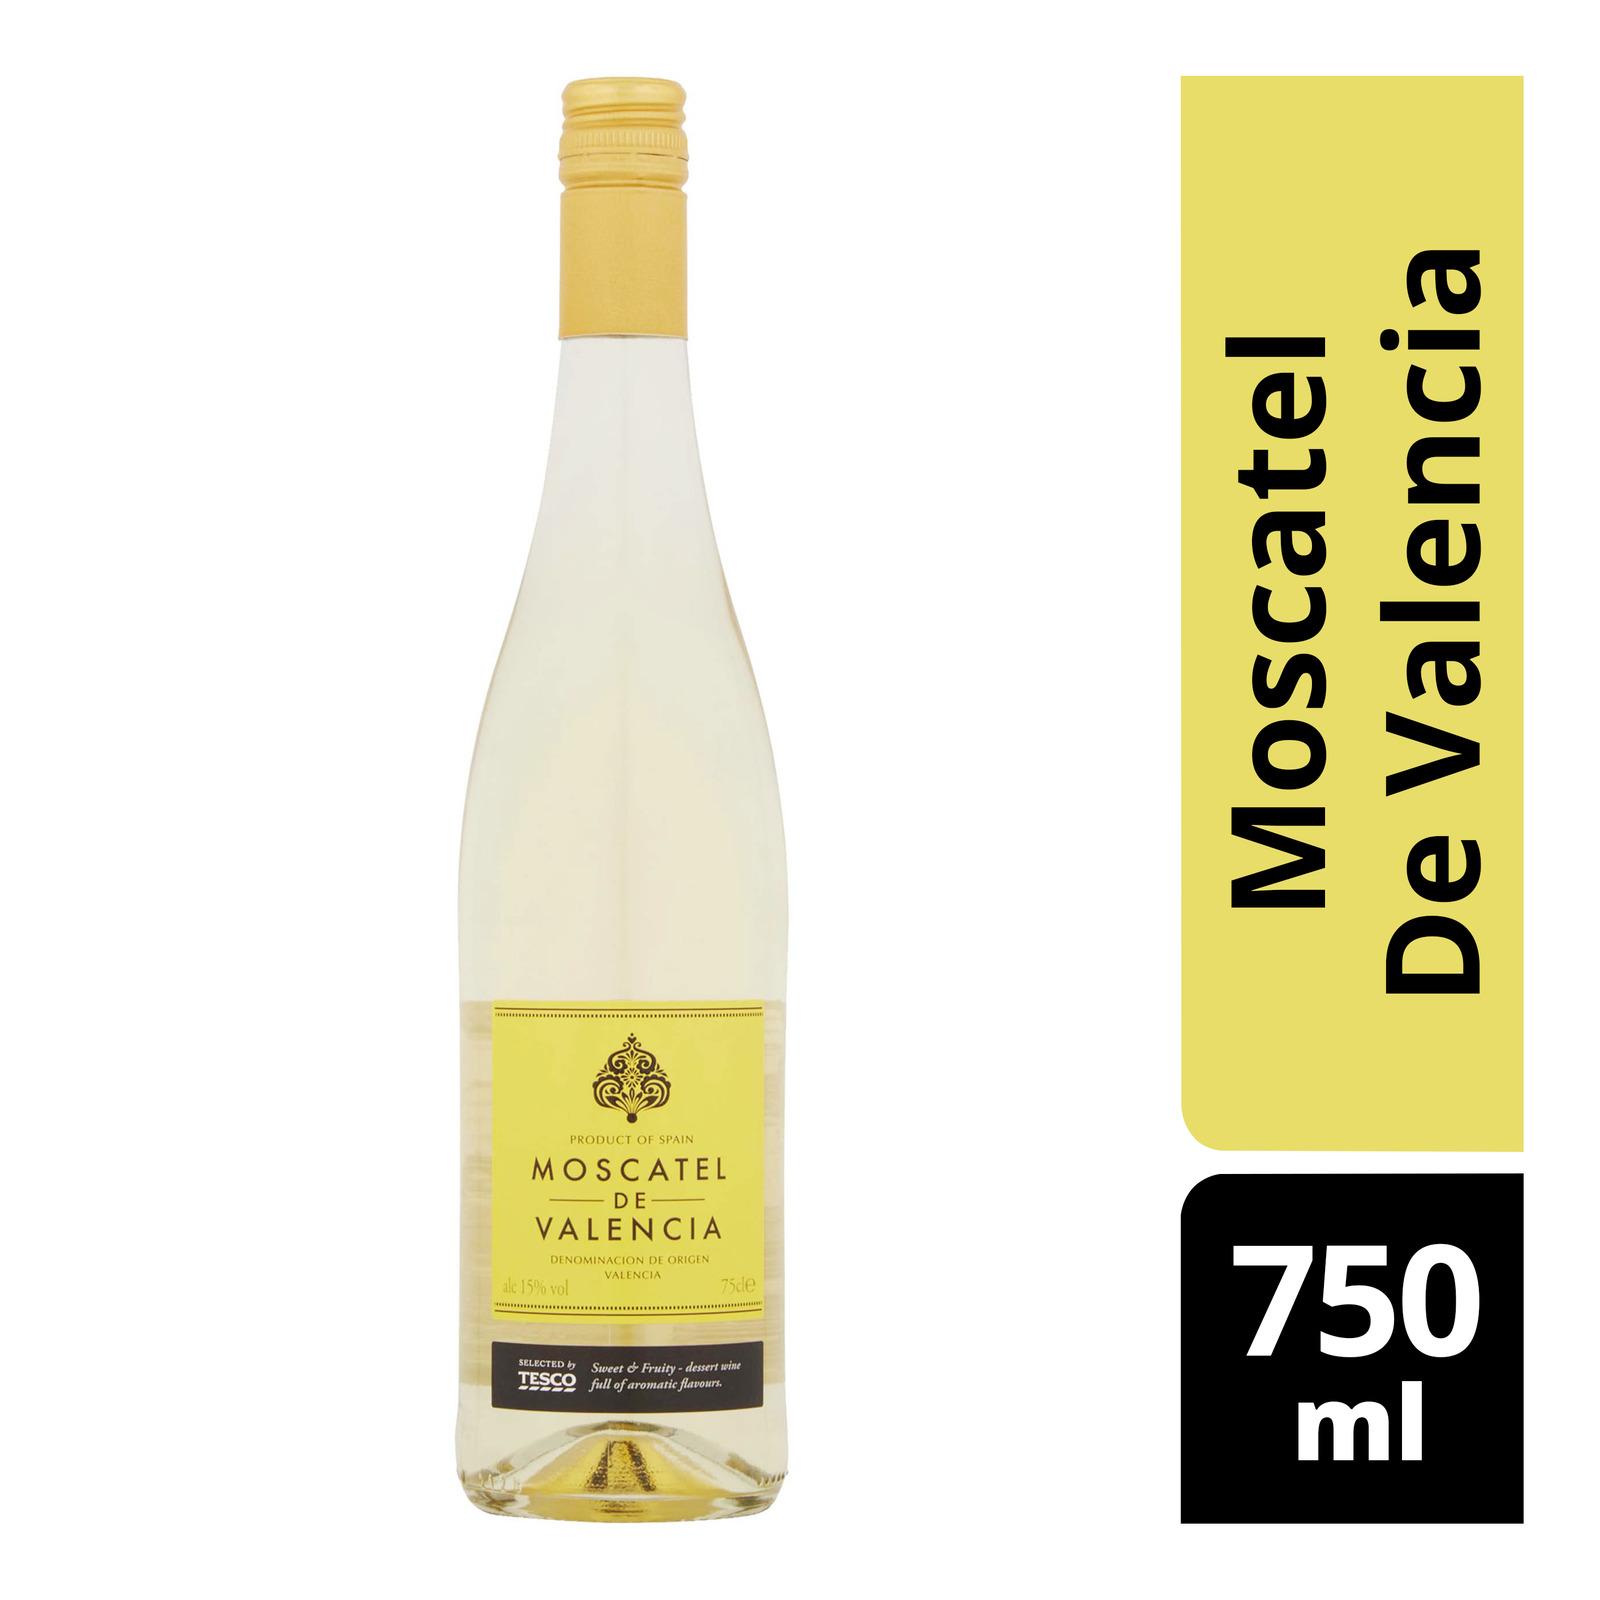 Tesco Sweet Wine - Moscatel De Valencia